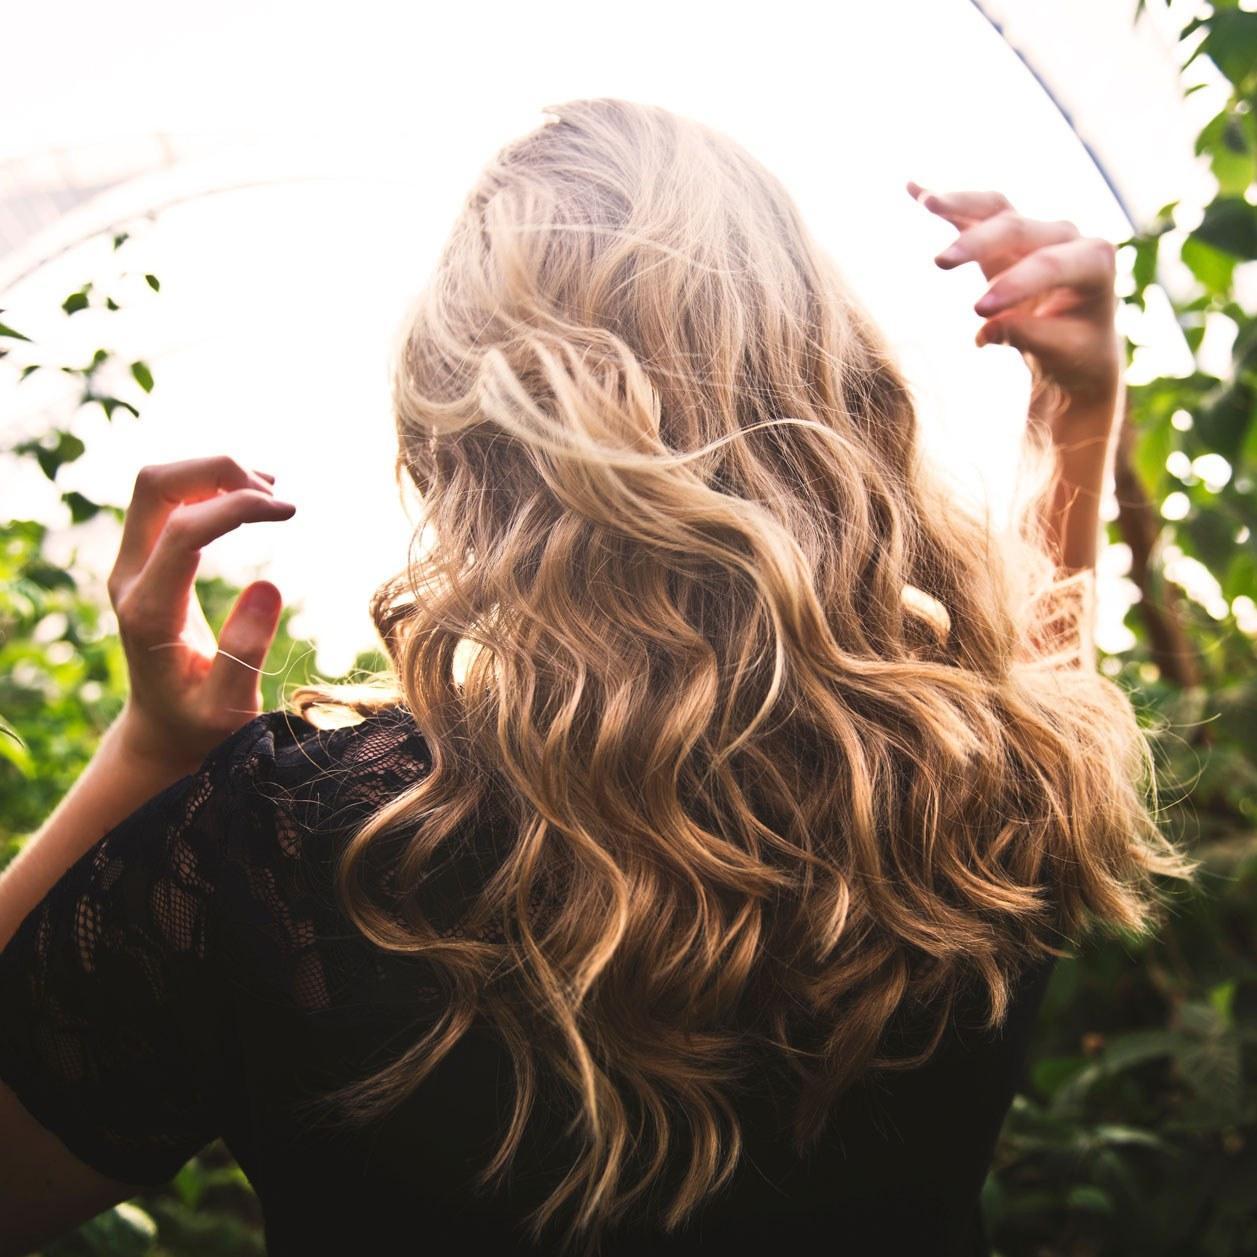 d889373e54ab38 Lockige Haare: Styling & Pflege-Tipps